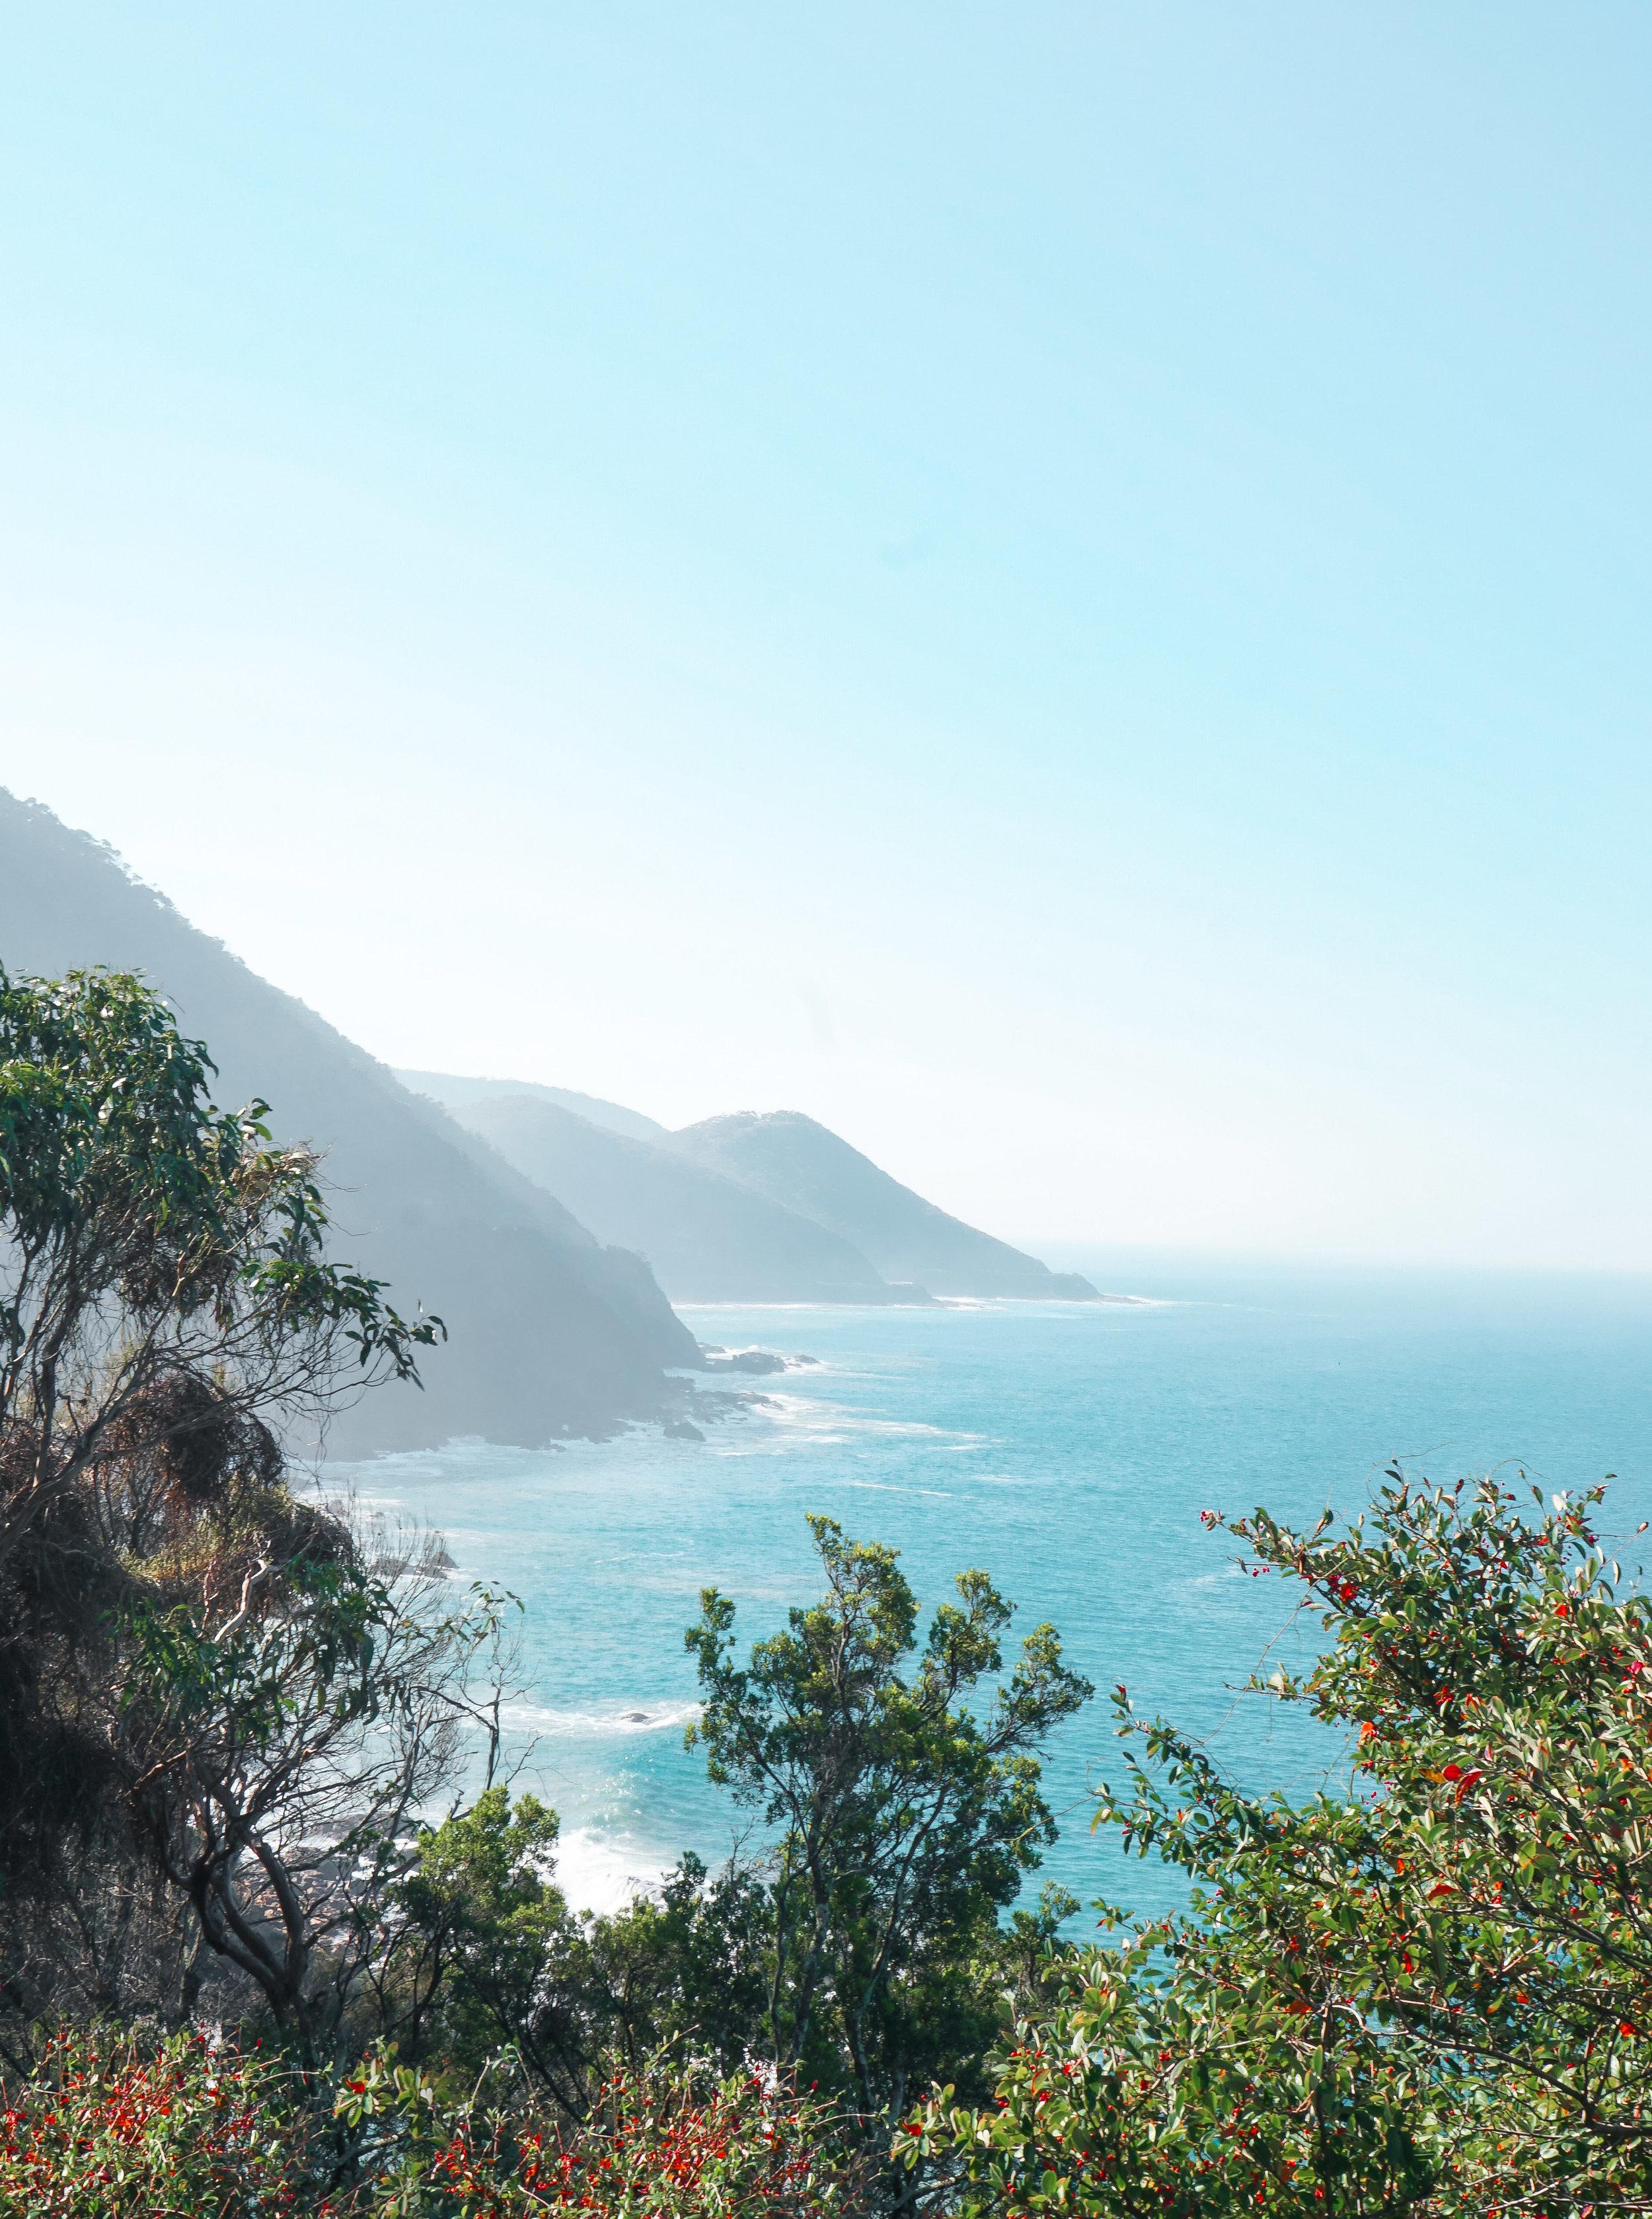 curio.trips.australia.victoria.great.ocean.road.view.portrait.jpg